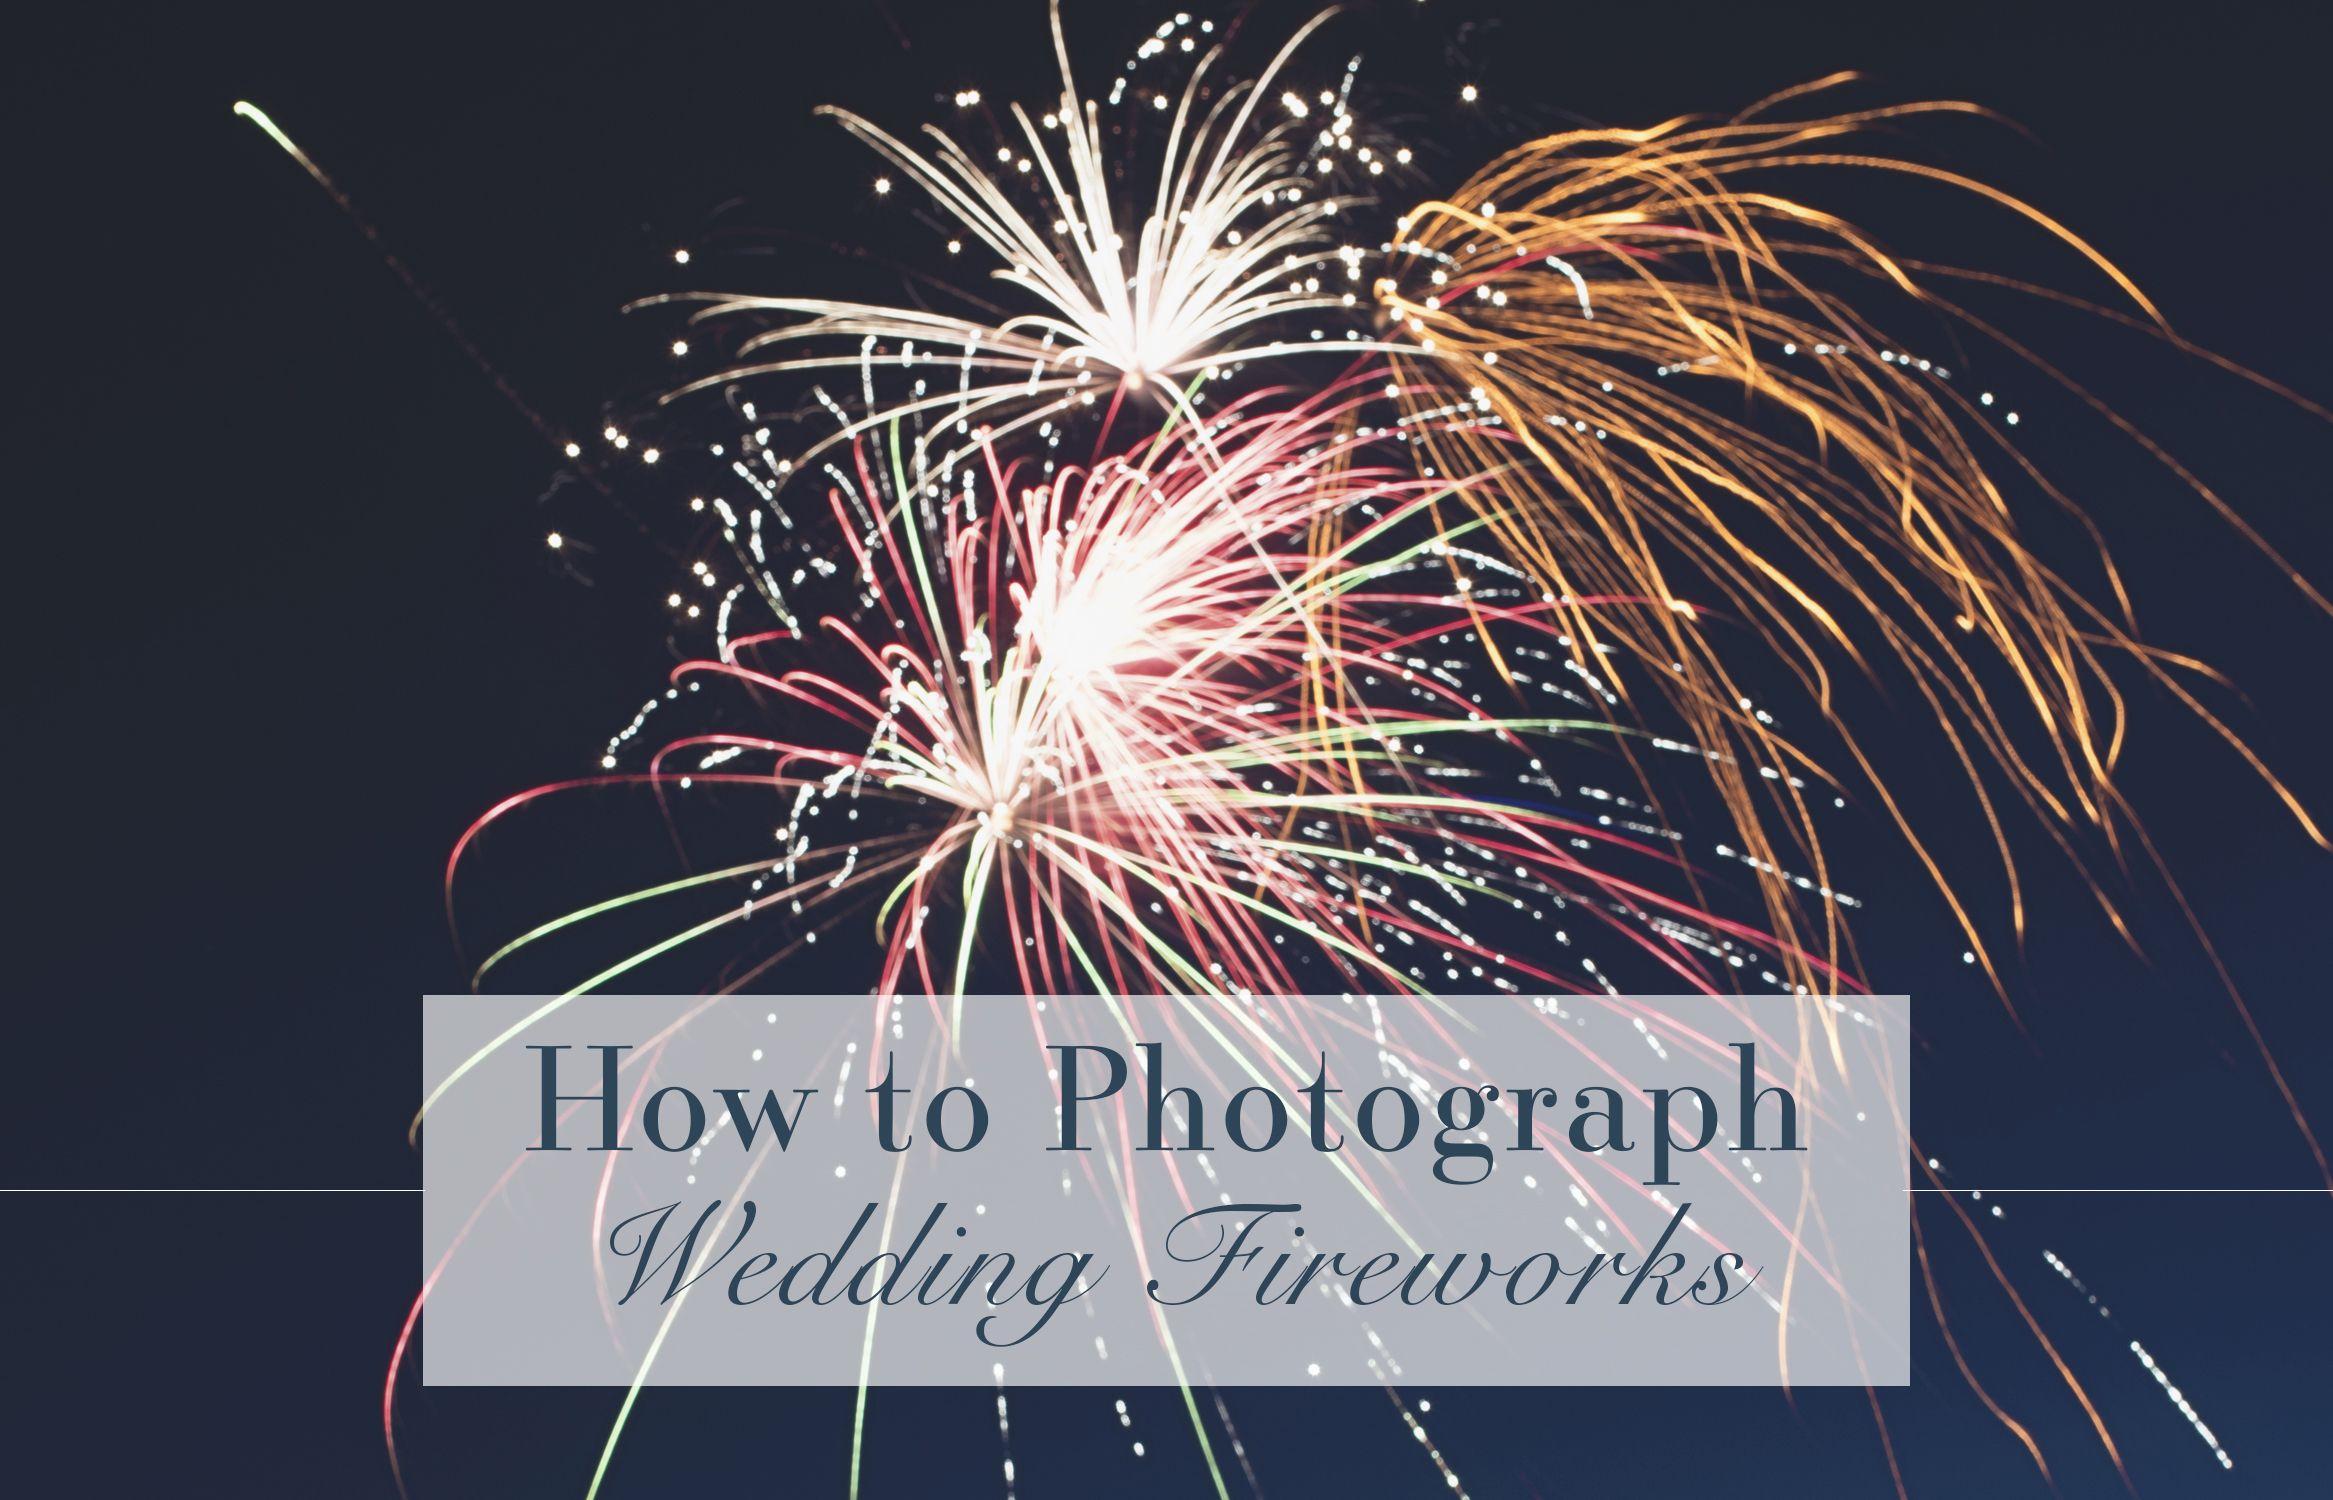 How To Photograph Wedding Fireworks Wedding Fireworks Fireworks